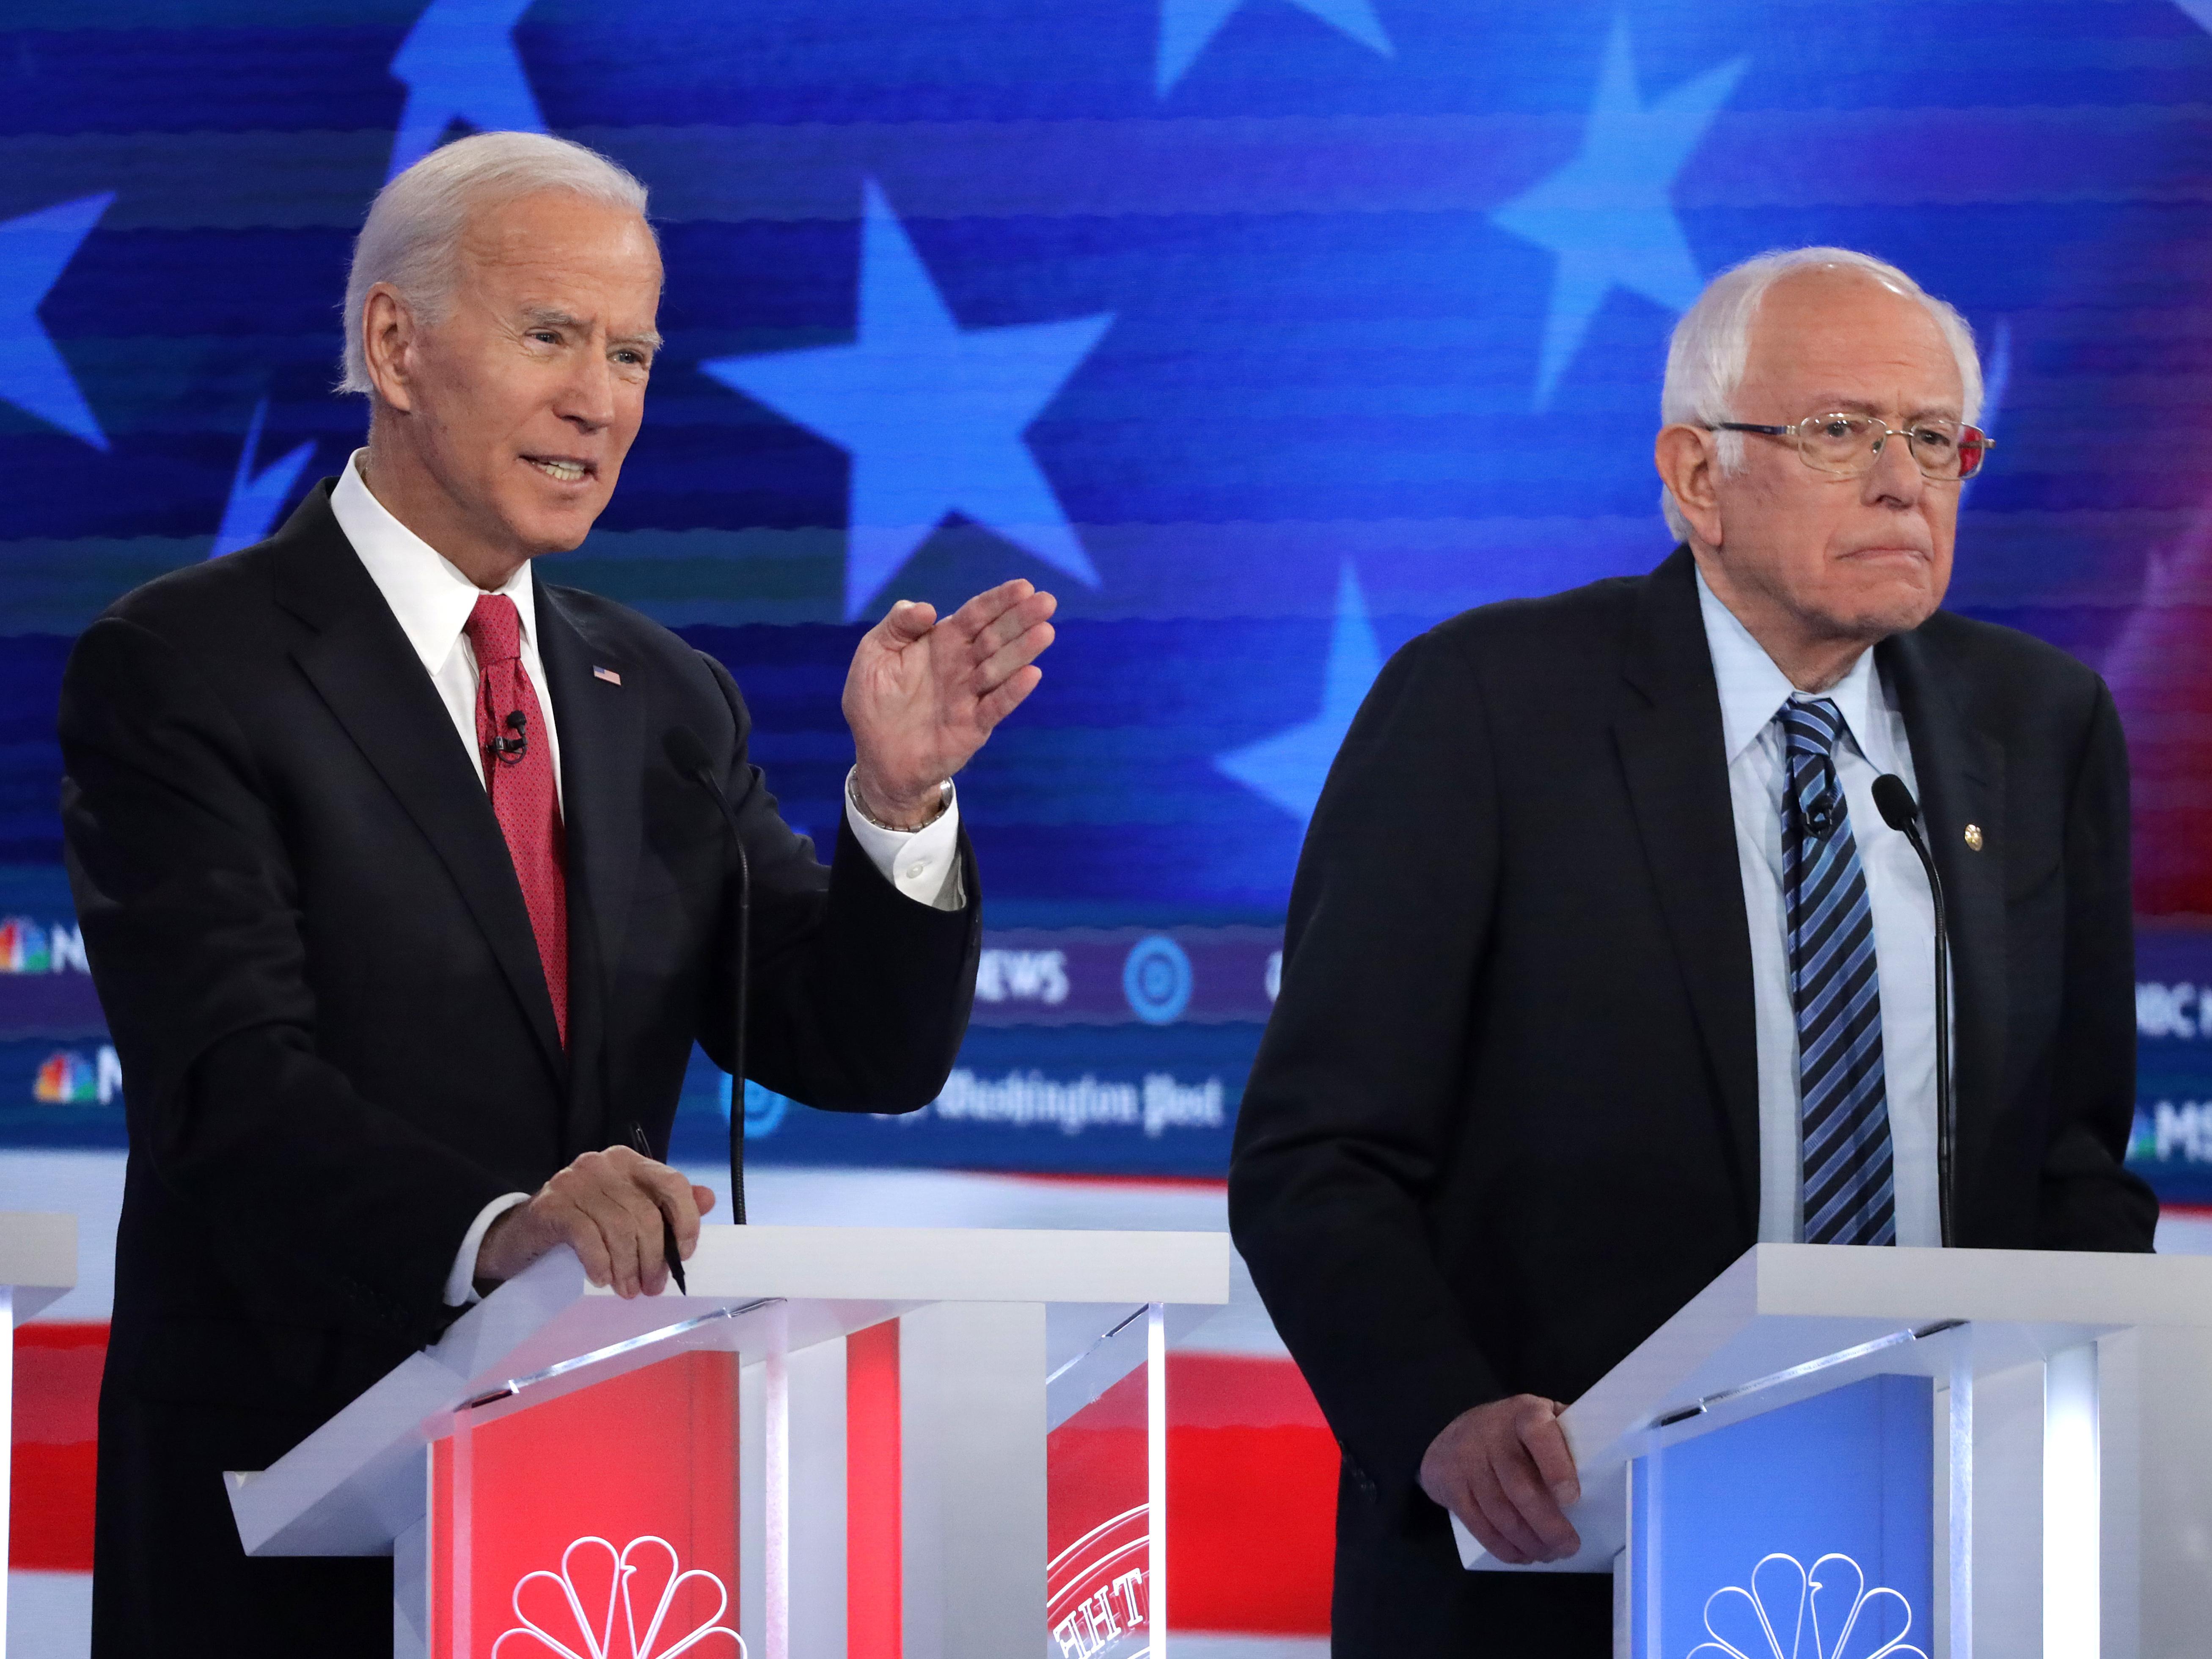 NPR/PBS NewsHour/Marist Poll: Biden, Sanders Lead 2020 Democratic Race